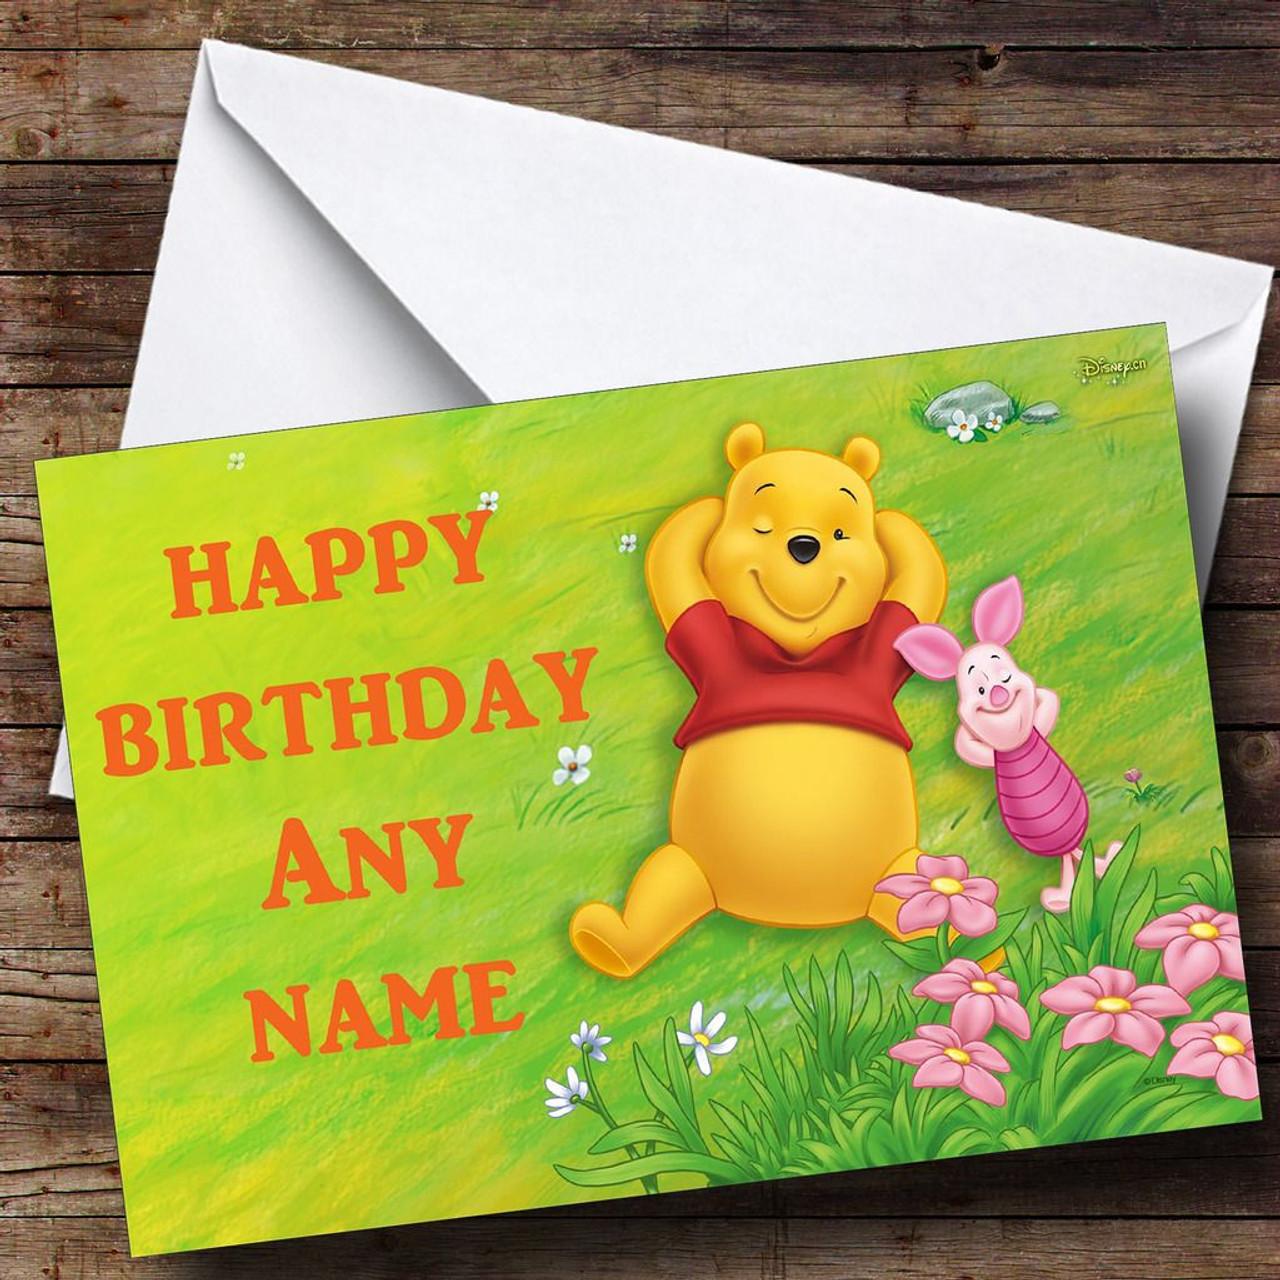 Winnie The Pooh Relaxing Personalised Birthday Card The Card Zoo – Pooh Birthday Cards